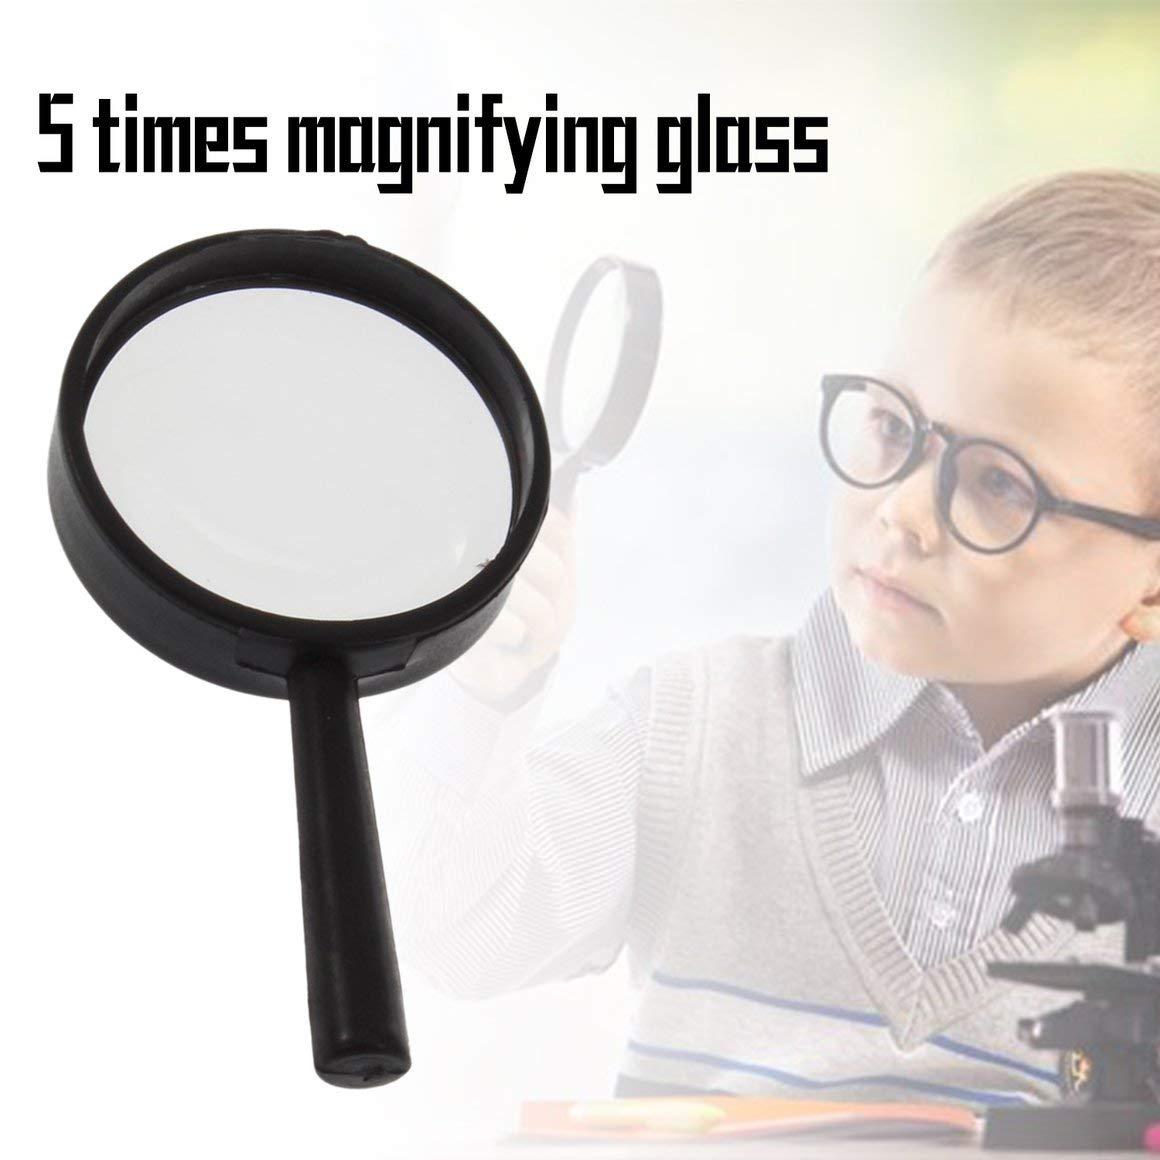 Negro Funnyrunstore Top Handheld Reading 5X Magnifier Hand Held Magnificador de acr/ílico 25mm Mini bolsillo Lupa Lupa Microscopio de lectura